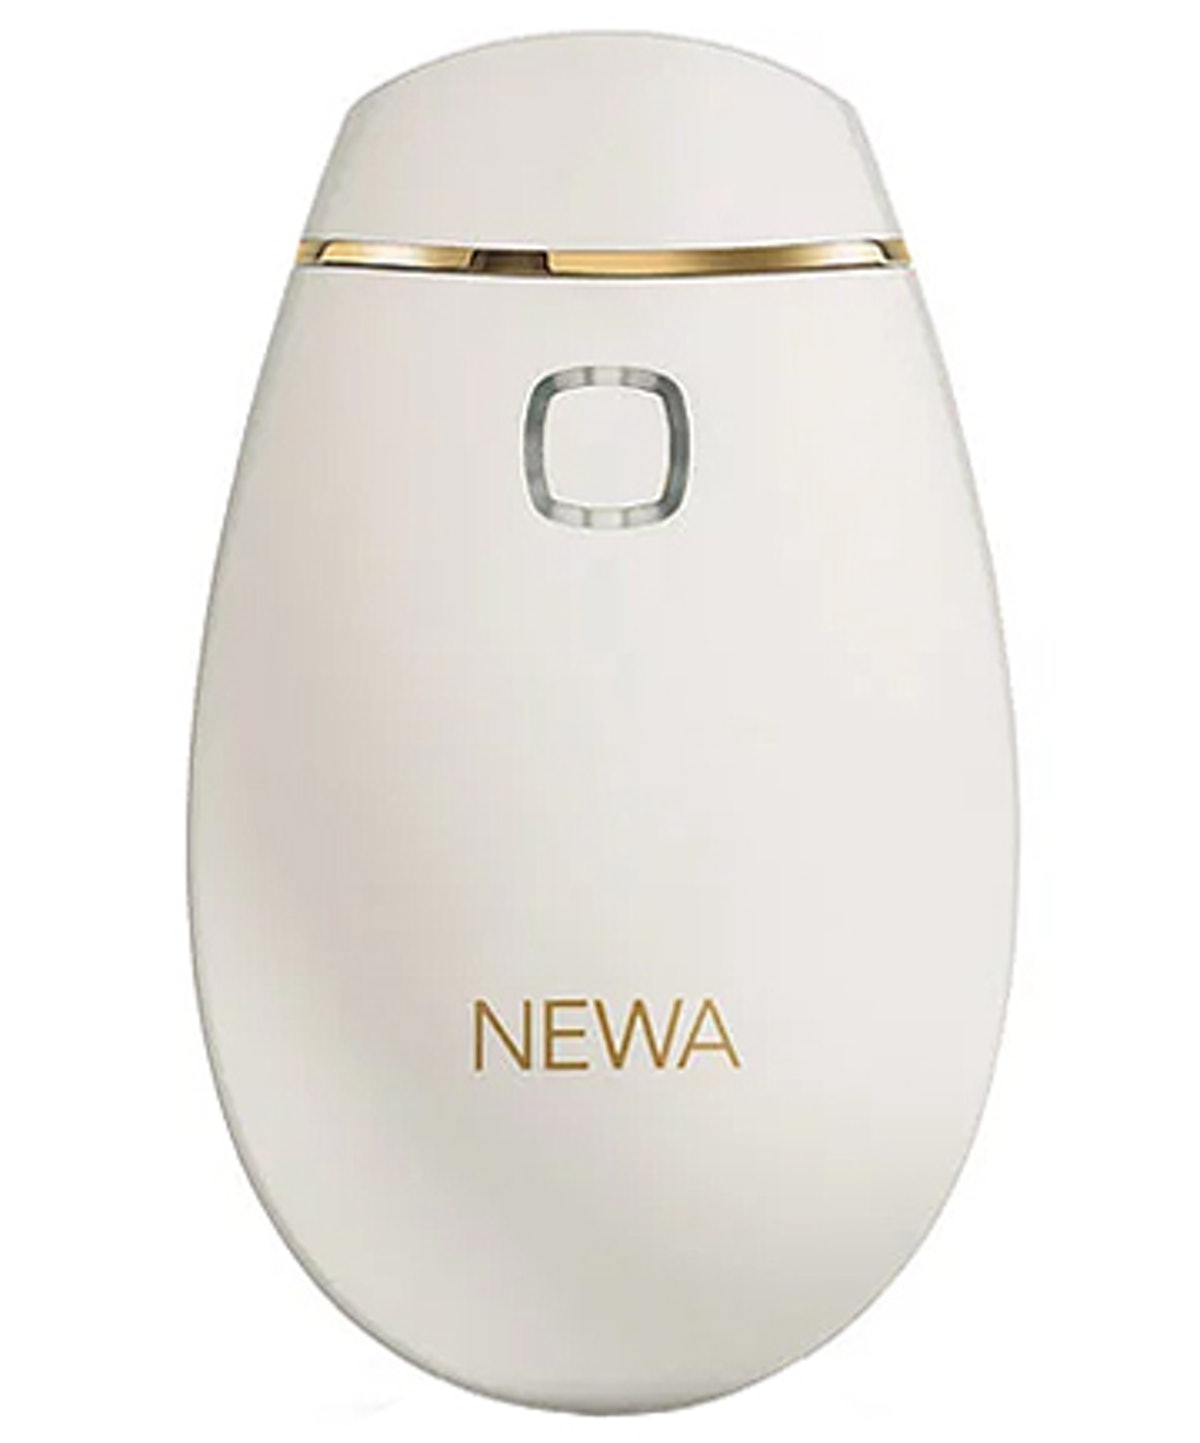 NEWA Medical Skin Rejuvenation Device